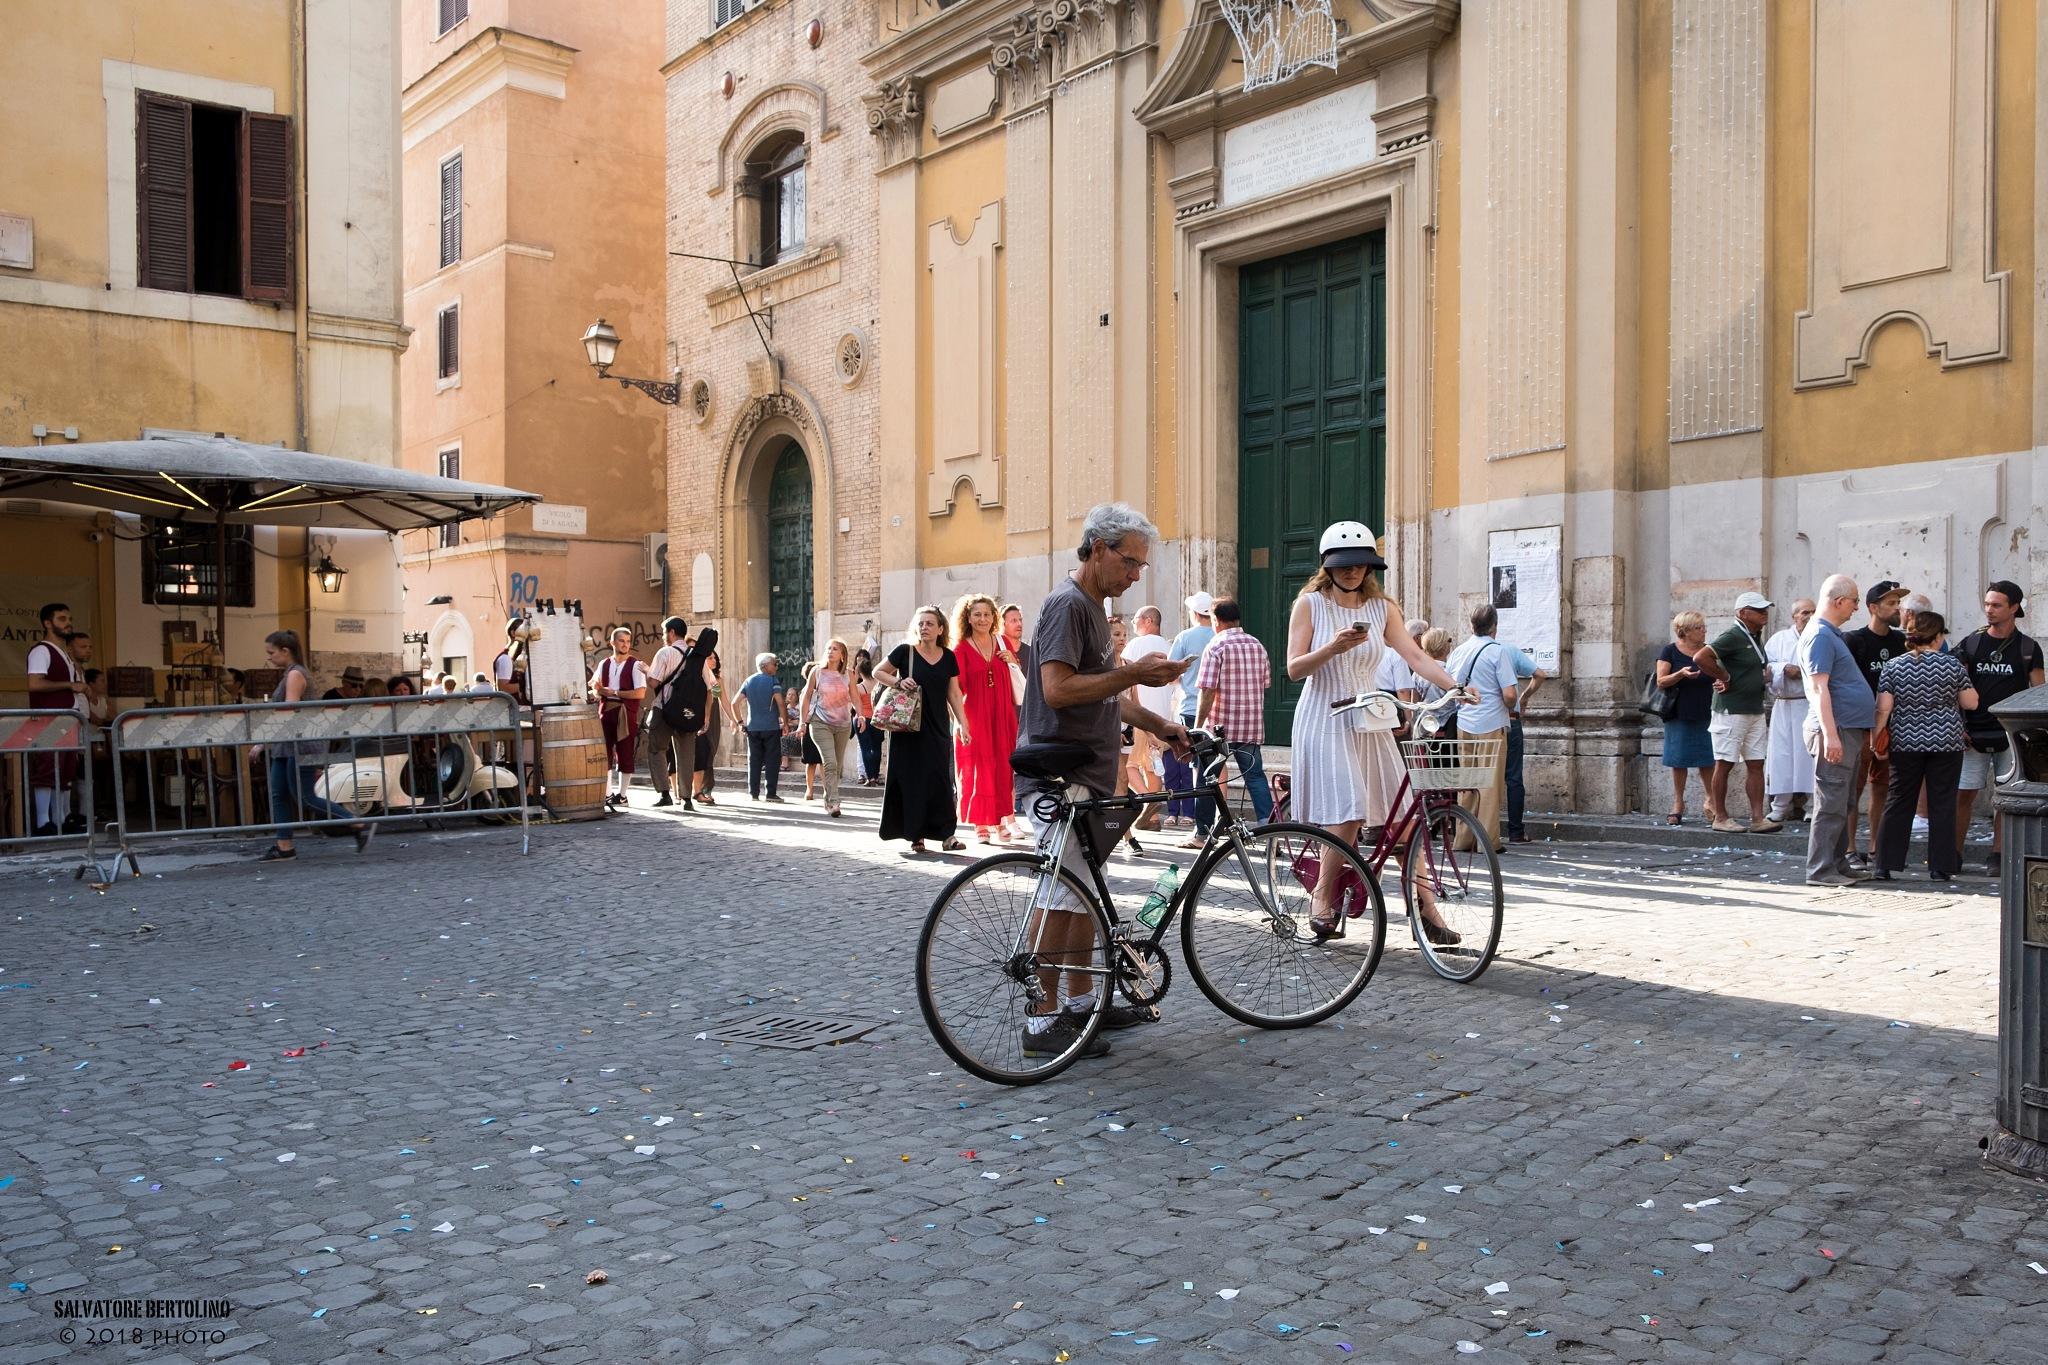 Appuntamento a Trastevere... by Salvatore Bertolino